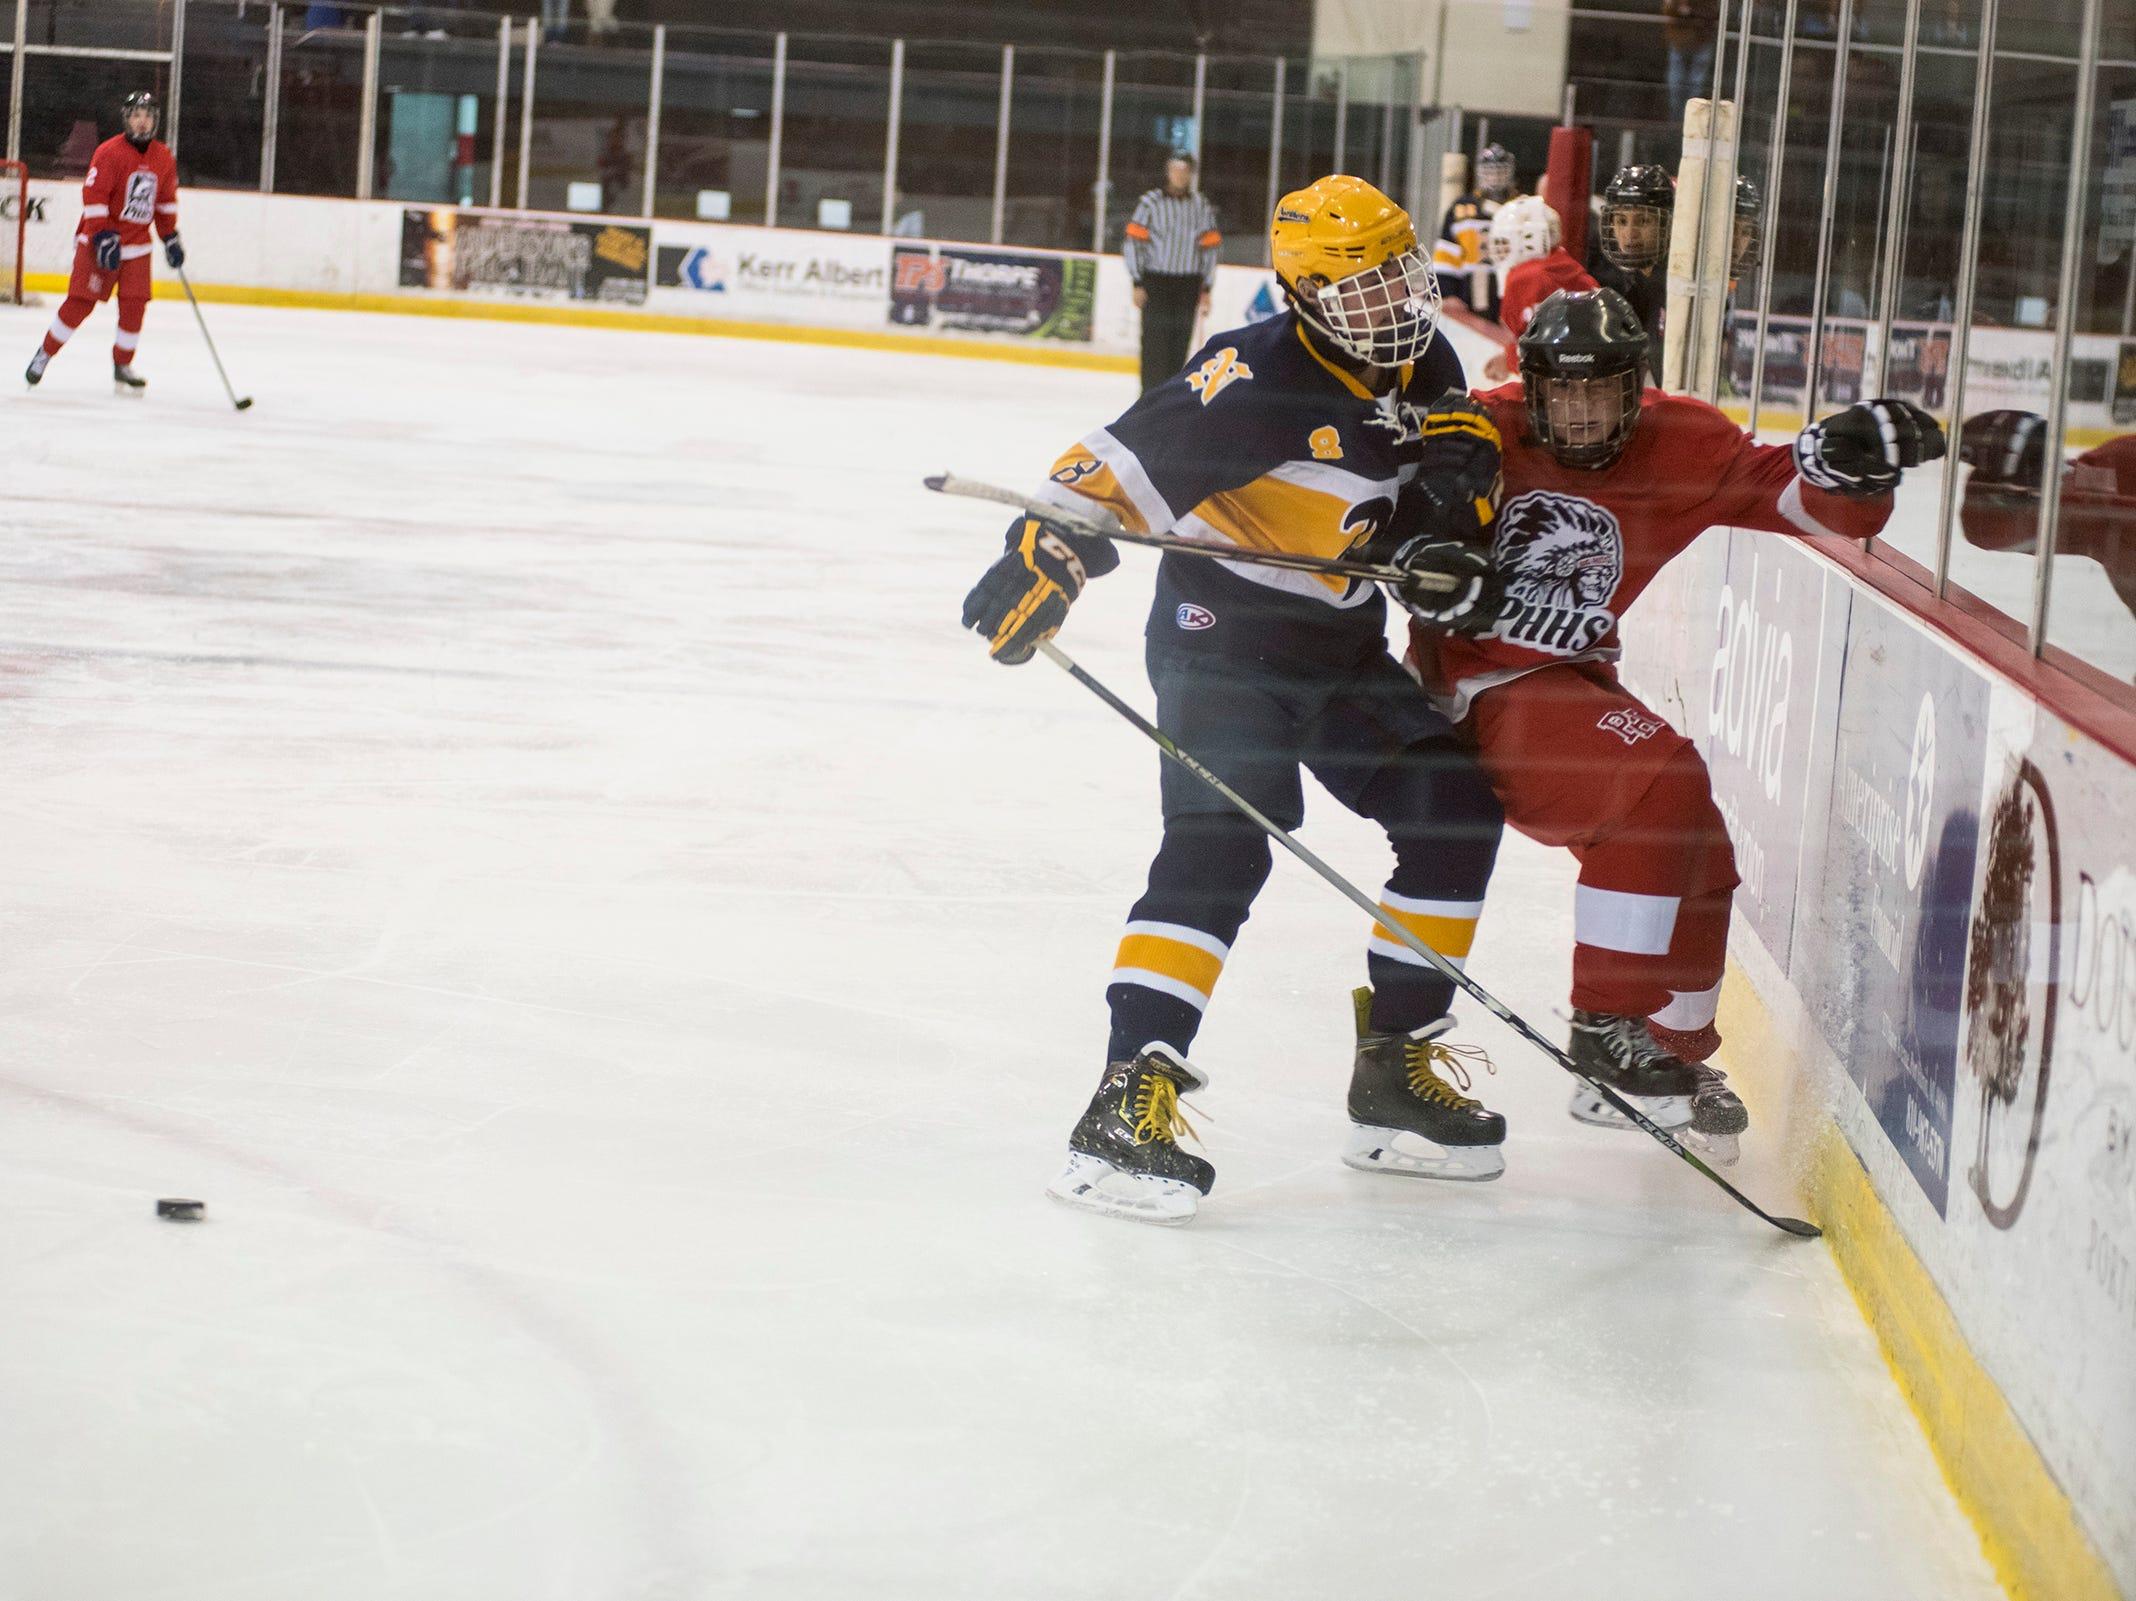 Port Huron Northern High School defense Owen Lawson (8) runs into Port Huron High School forward Matthew Fleming during the Larry Manz Holiday Hockey Tournament Friday, Nov. 23, 2018 at McMorran Arena.